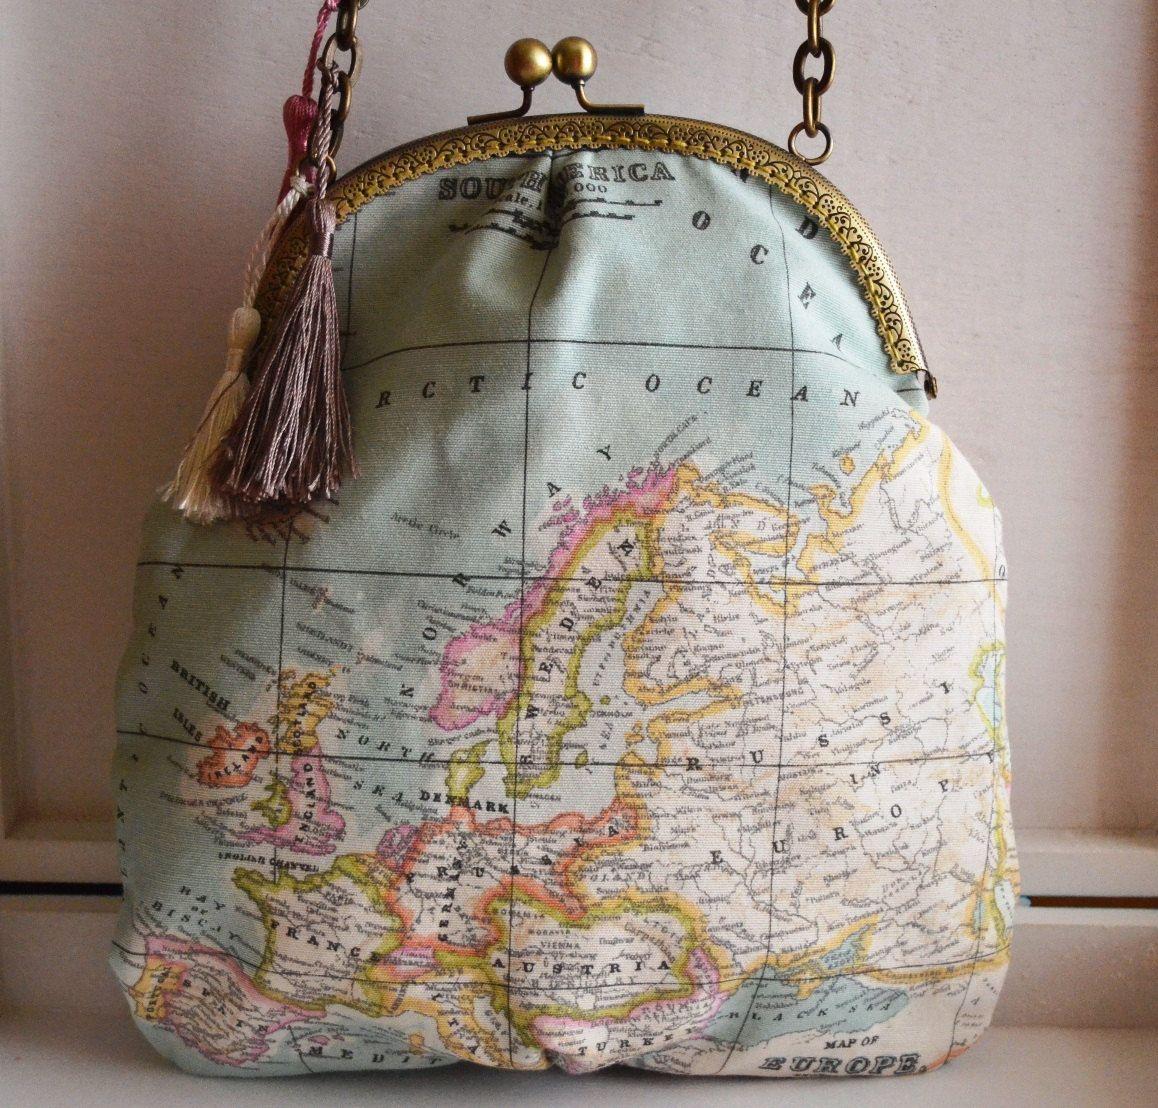 Bon voyage kiss lock bag world map fabric by pupettas on etsy bon voyage kiss lock bag world map fabric by pupettas on etsy gumiabroncs Images